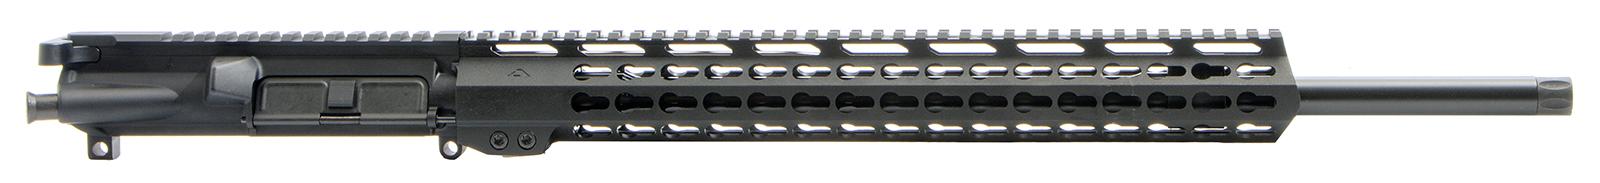 ar-15-upper-assembly-20-224-valkyrie-nitride-17-15-keymod-160893